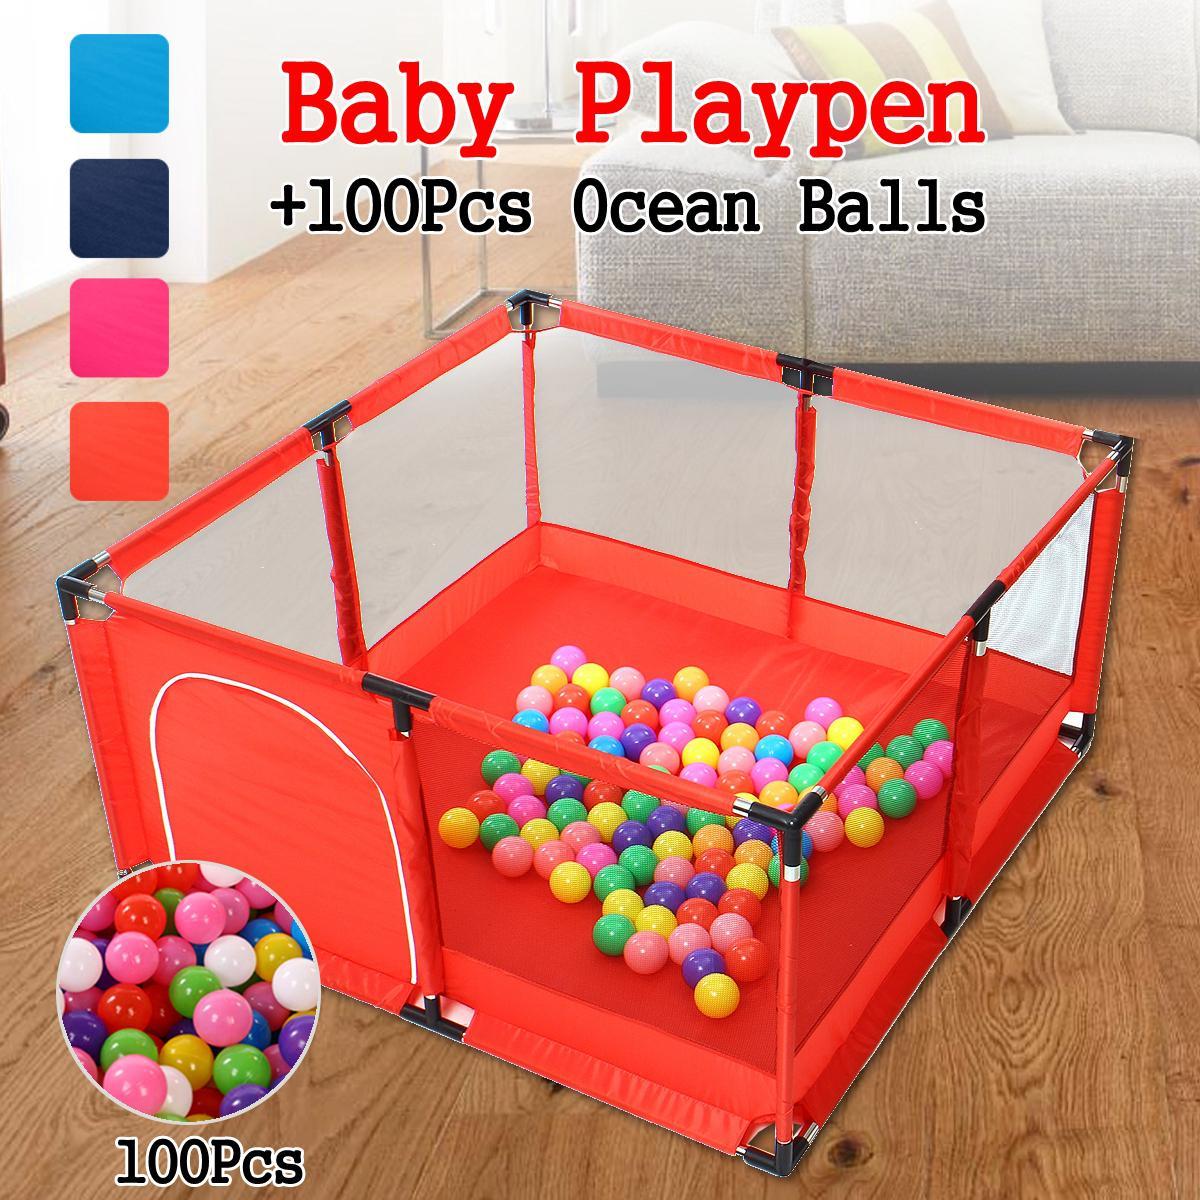 Hot Baby Safety Playpen Toddler Folding Play Yard Ocean Ball Pool Kids Play Tent